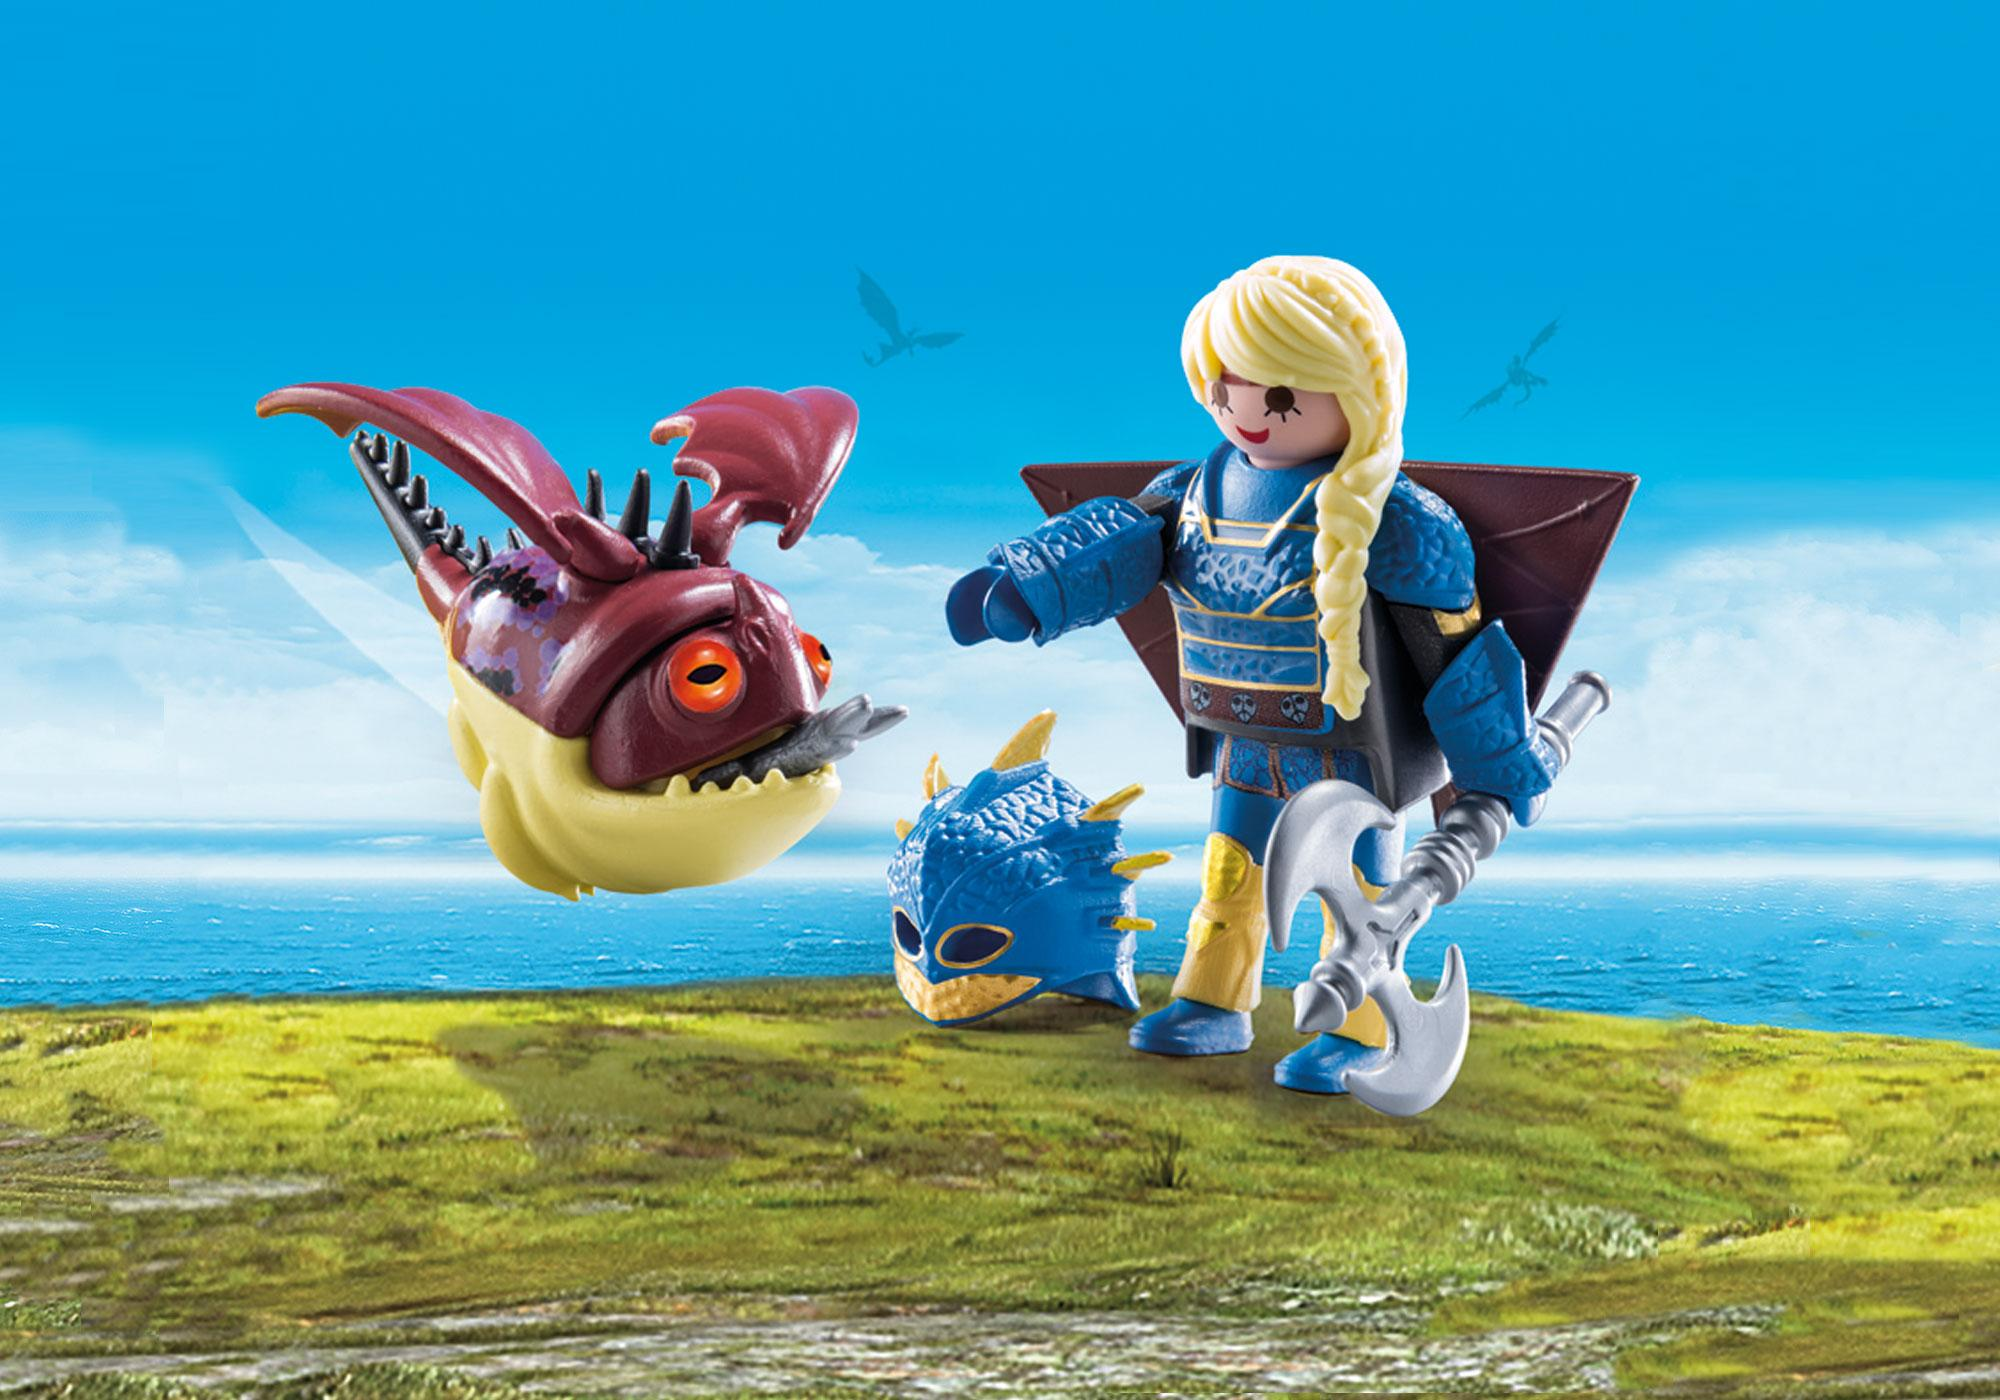 http://media.playmobil.com/i/playmobil/70041_product_detail/H Άστριντ με Φτεροστολή και ο Ξωτικoμάτης